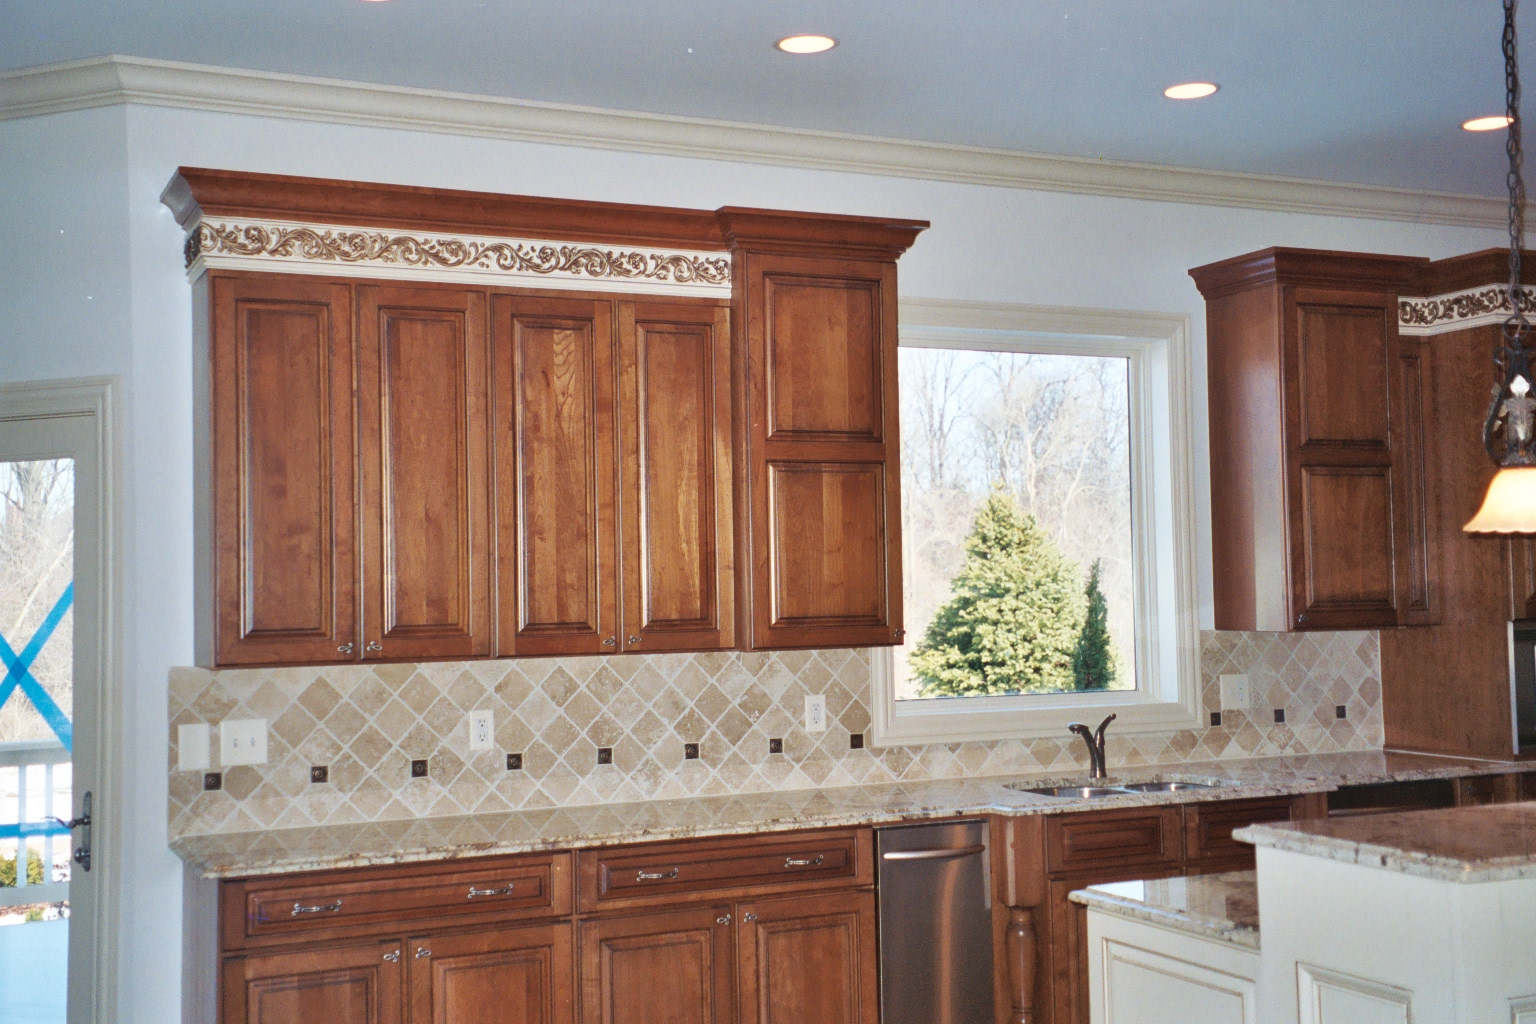 where to end kitchen backsplash tiles